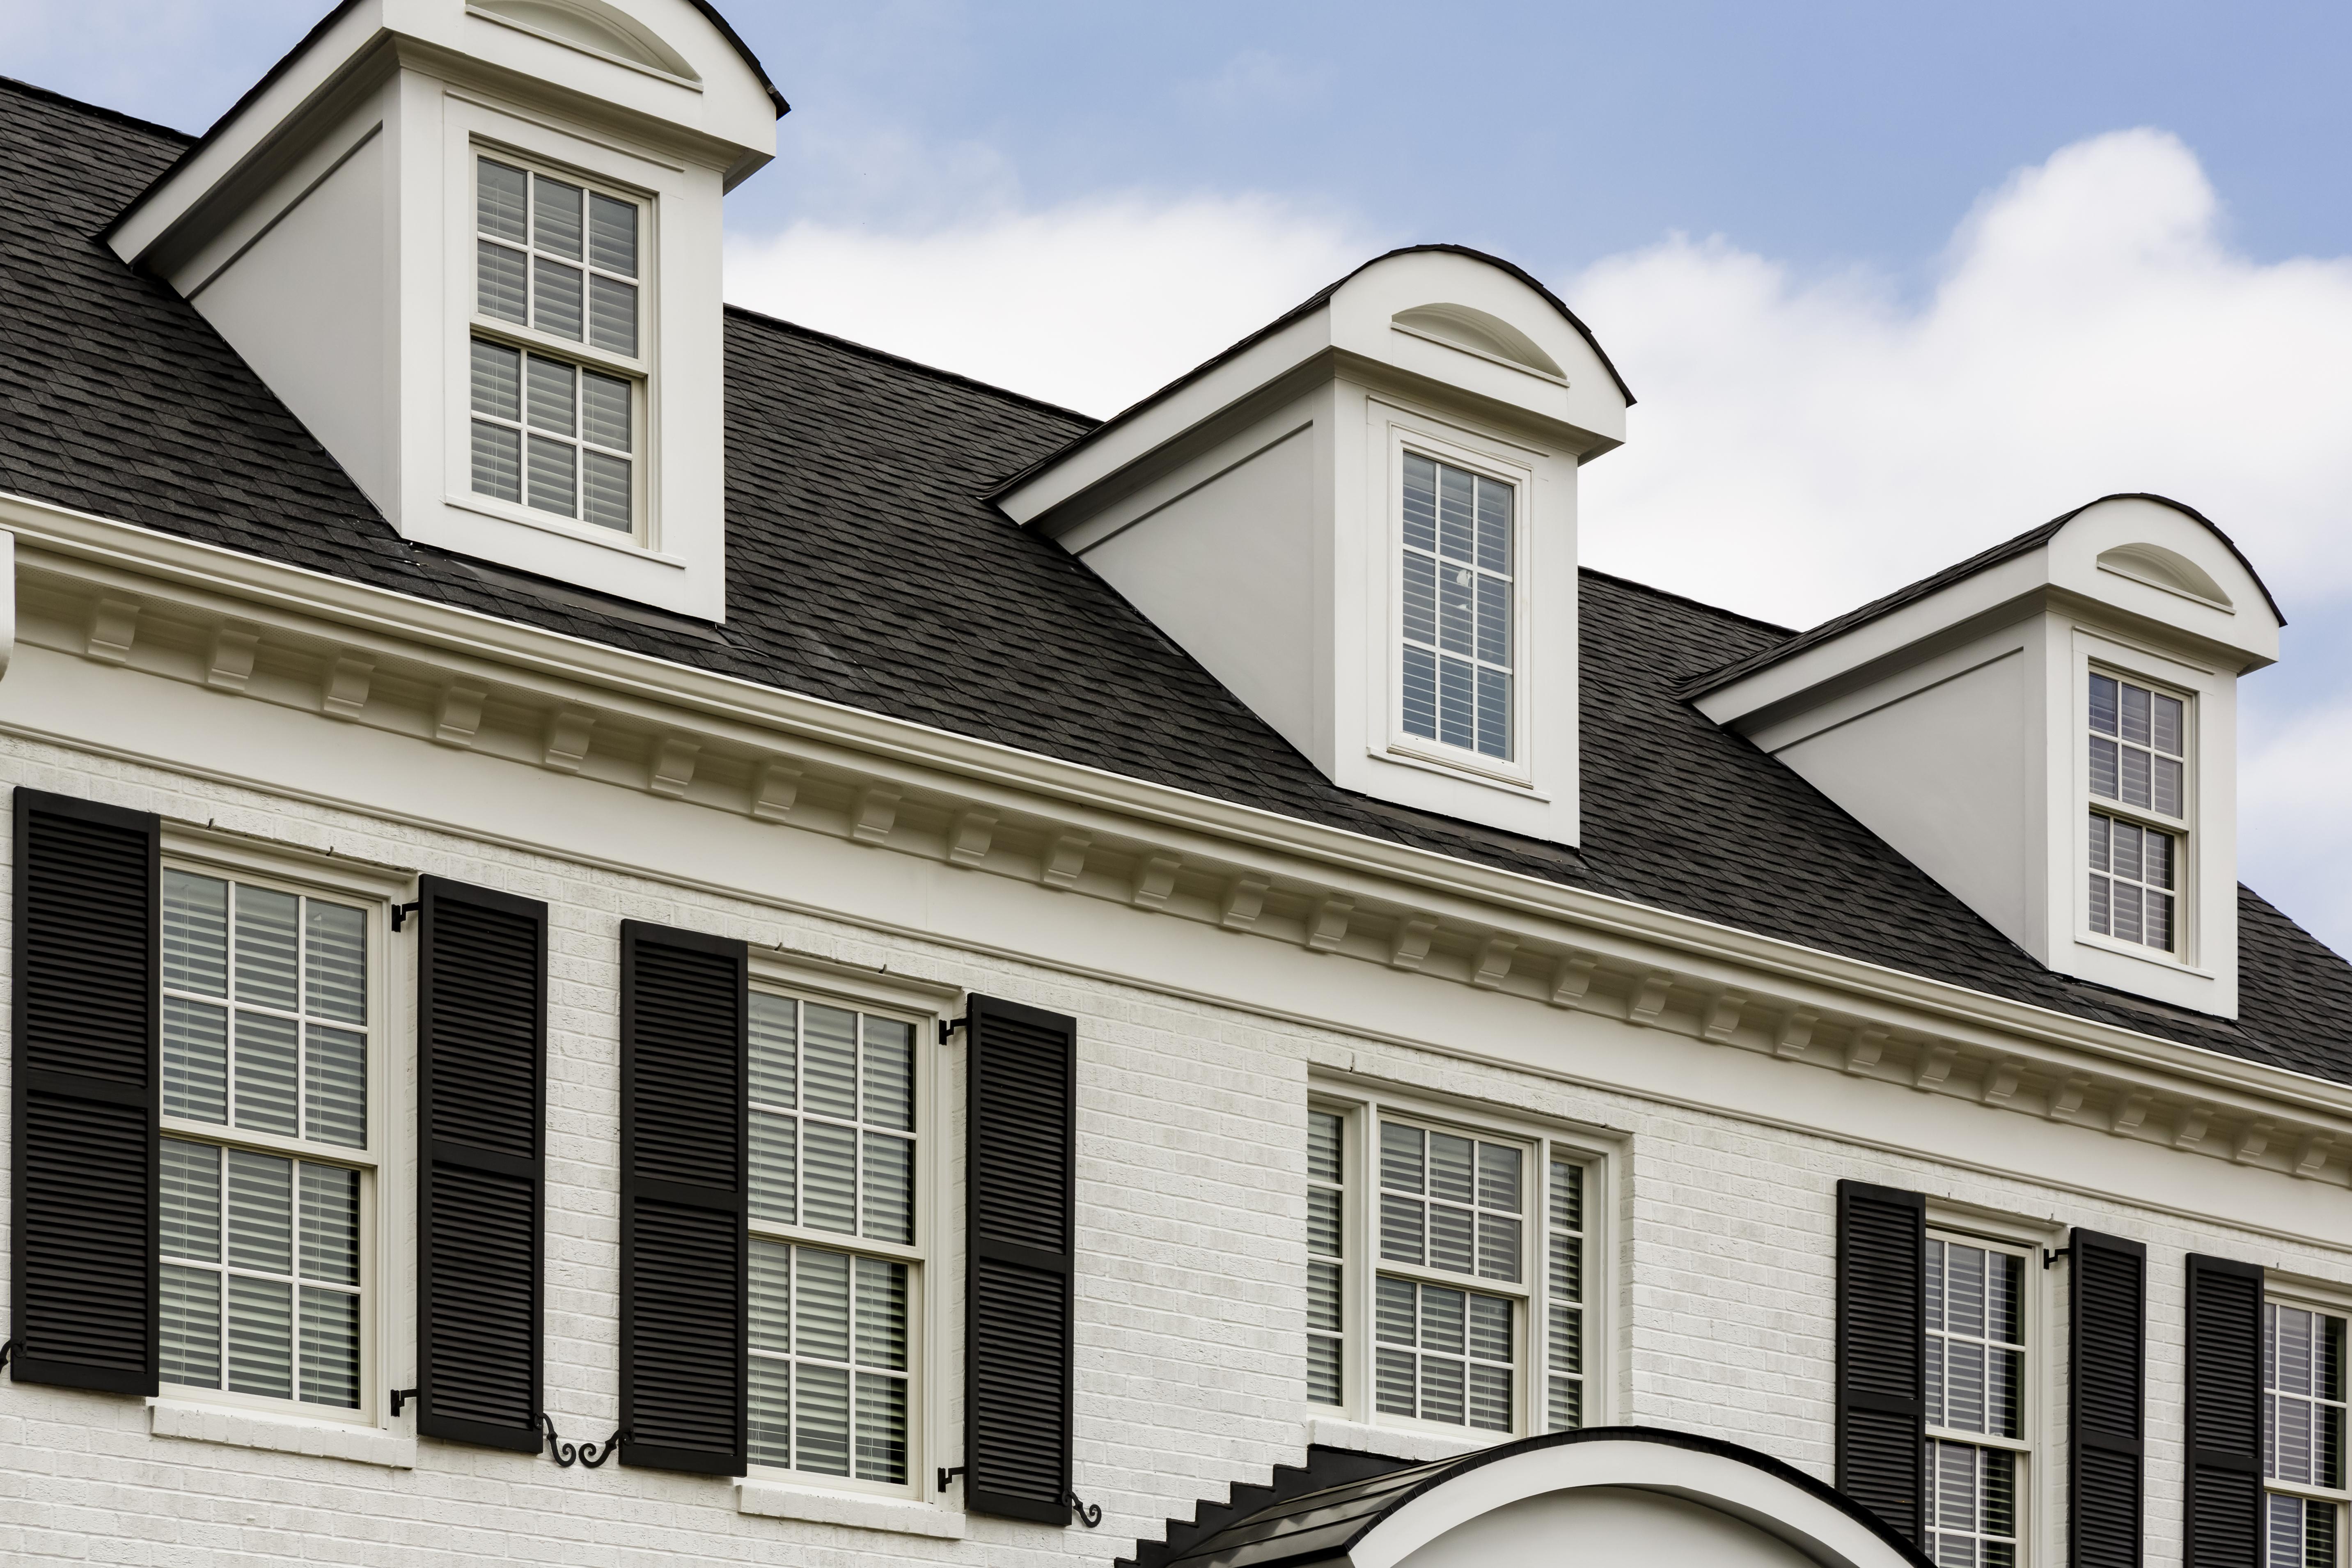 & Understanding a roof dormer - Charlotte Pro Roofing memphite.com